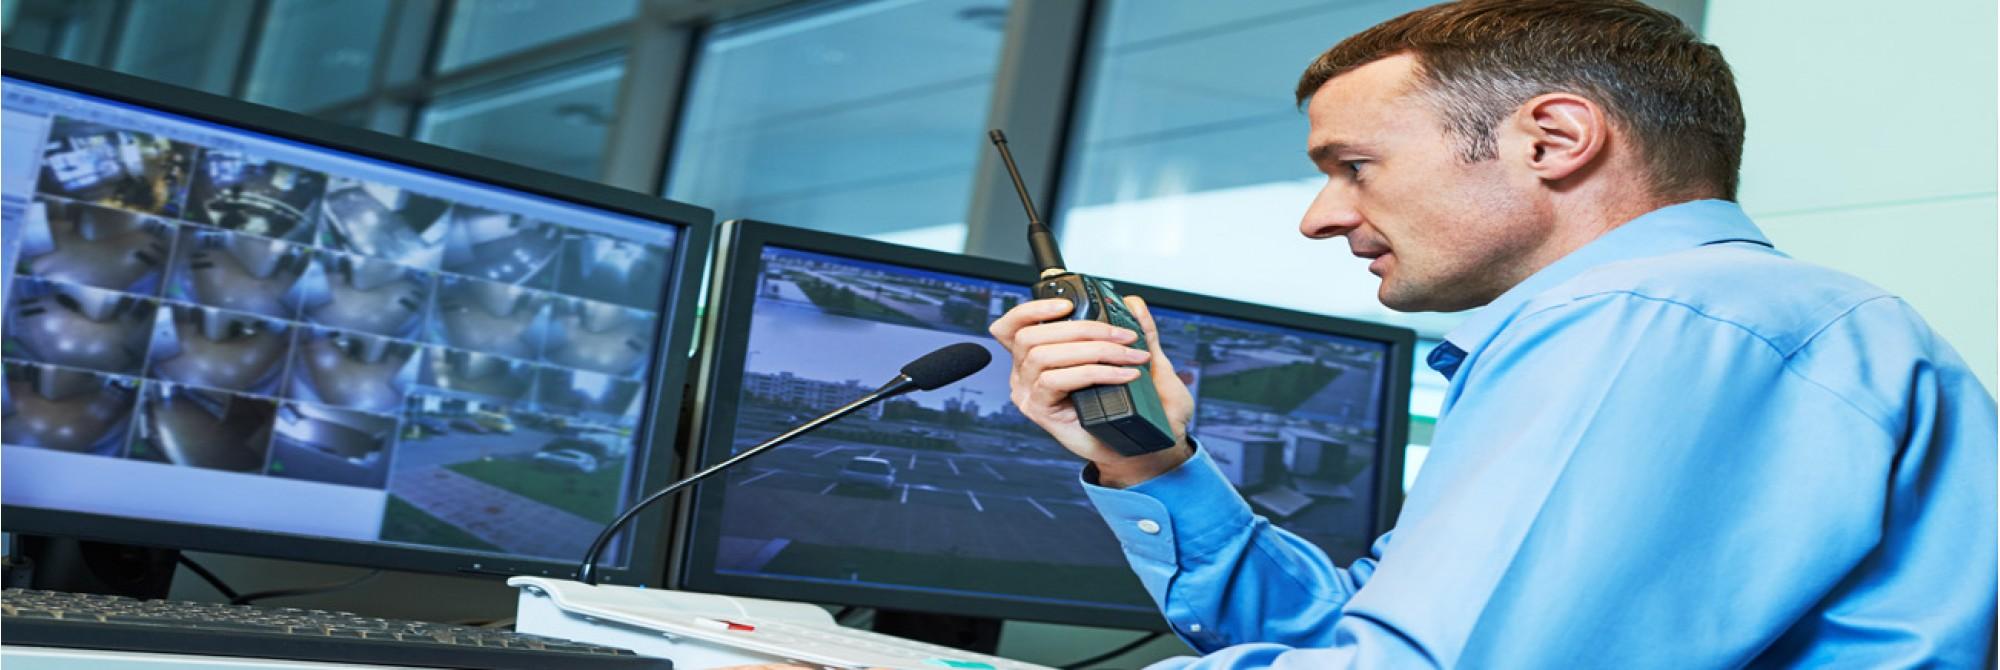 Smart Cities & Surveillance Made Easy